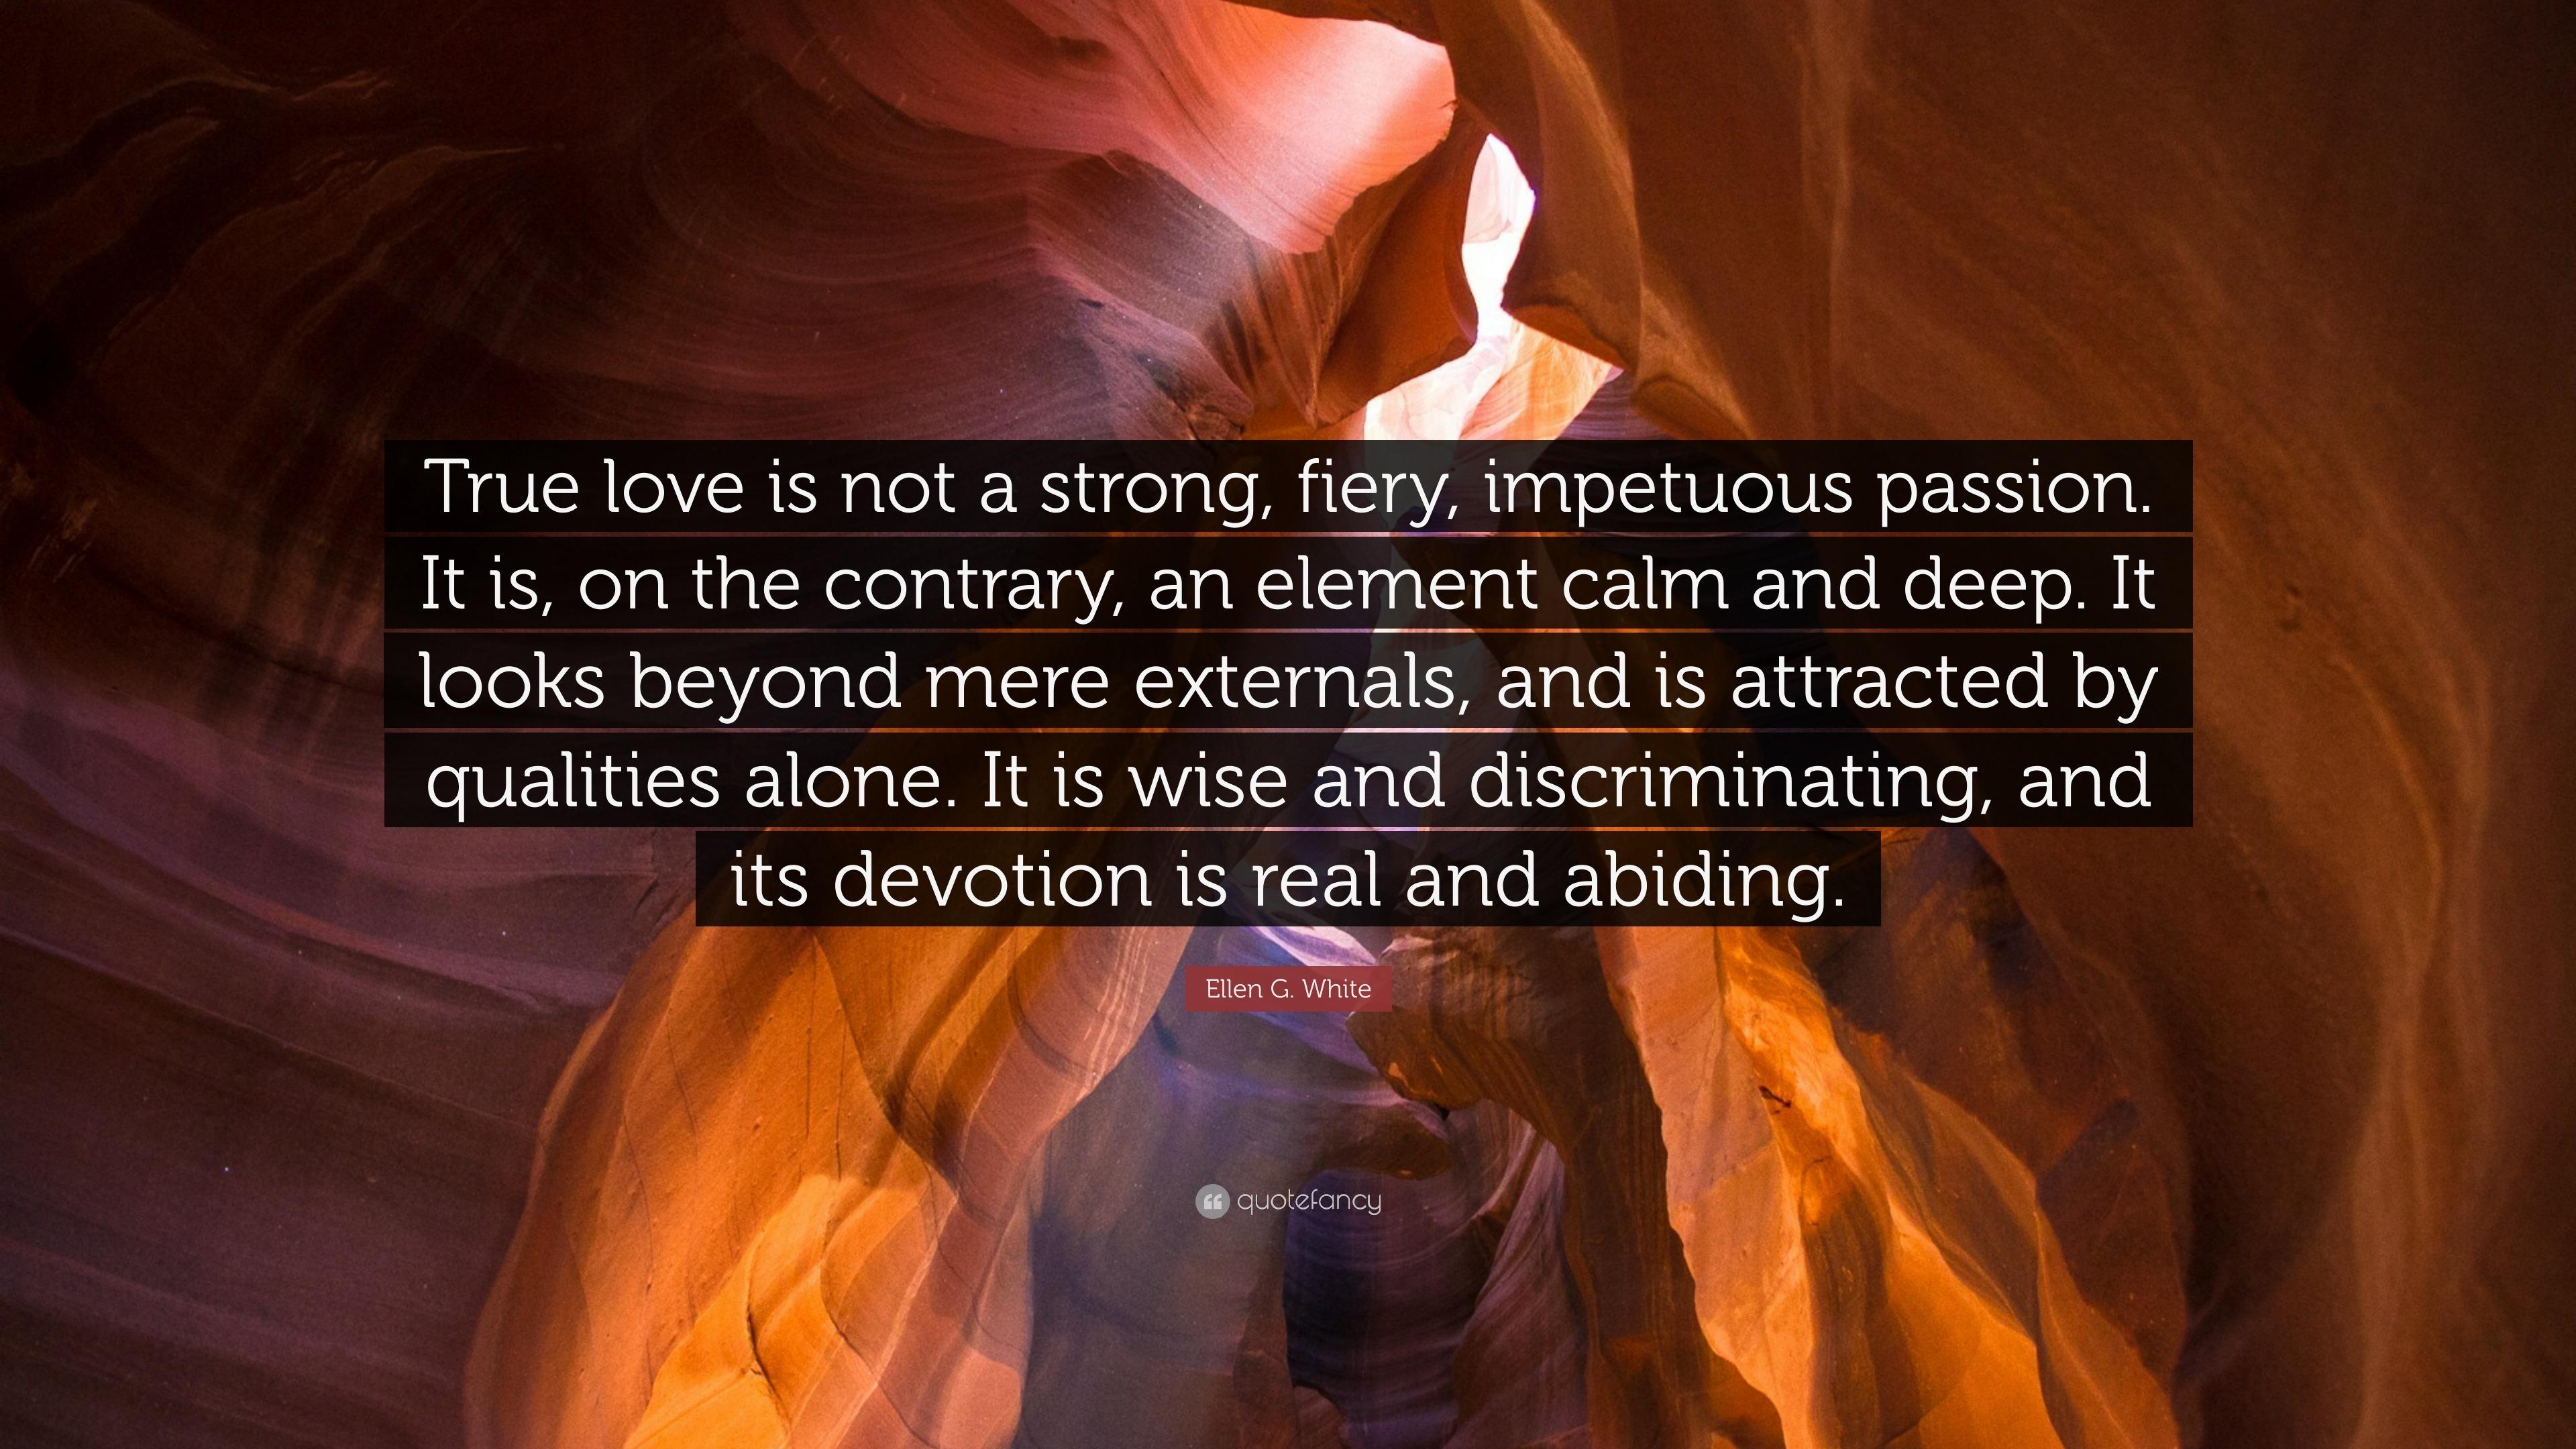 Ellen G White Quote True Love Is Not A Strong Fiery